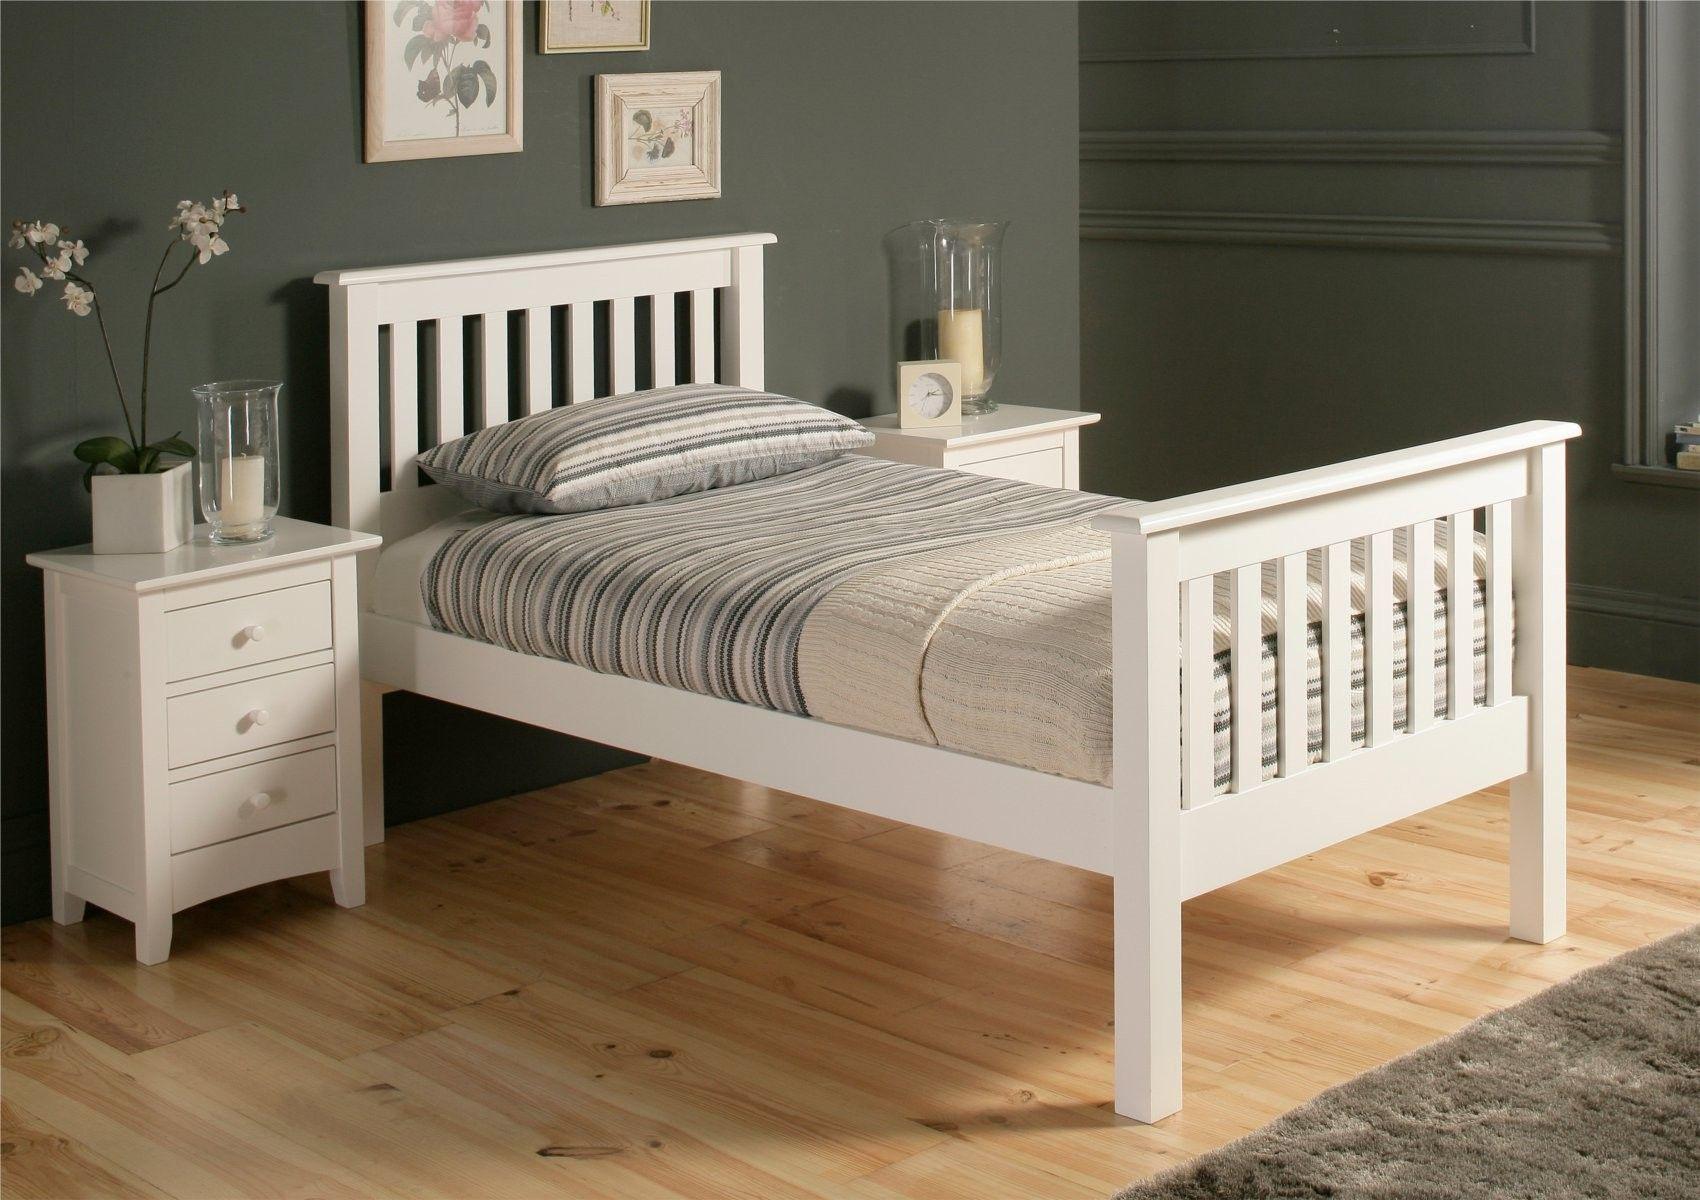 Shaker Solo White Wooden Bed Frame £159.00 White wooden